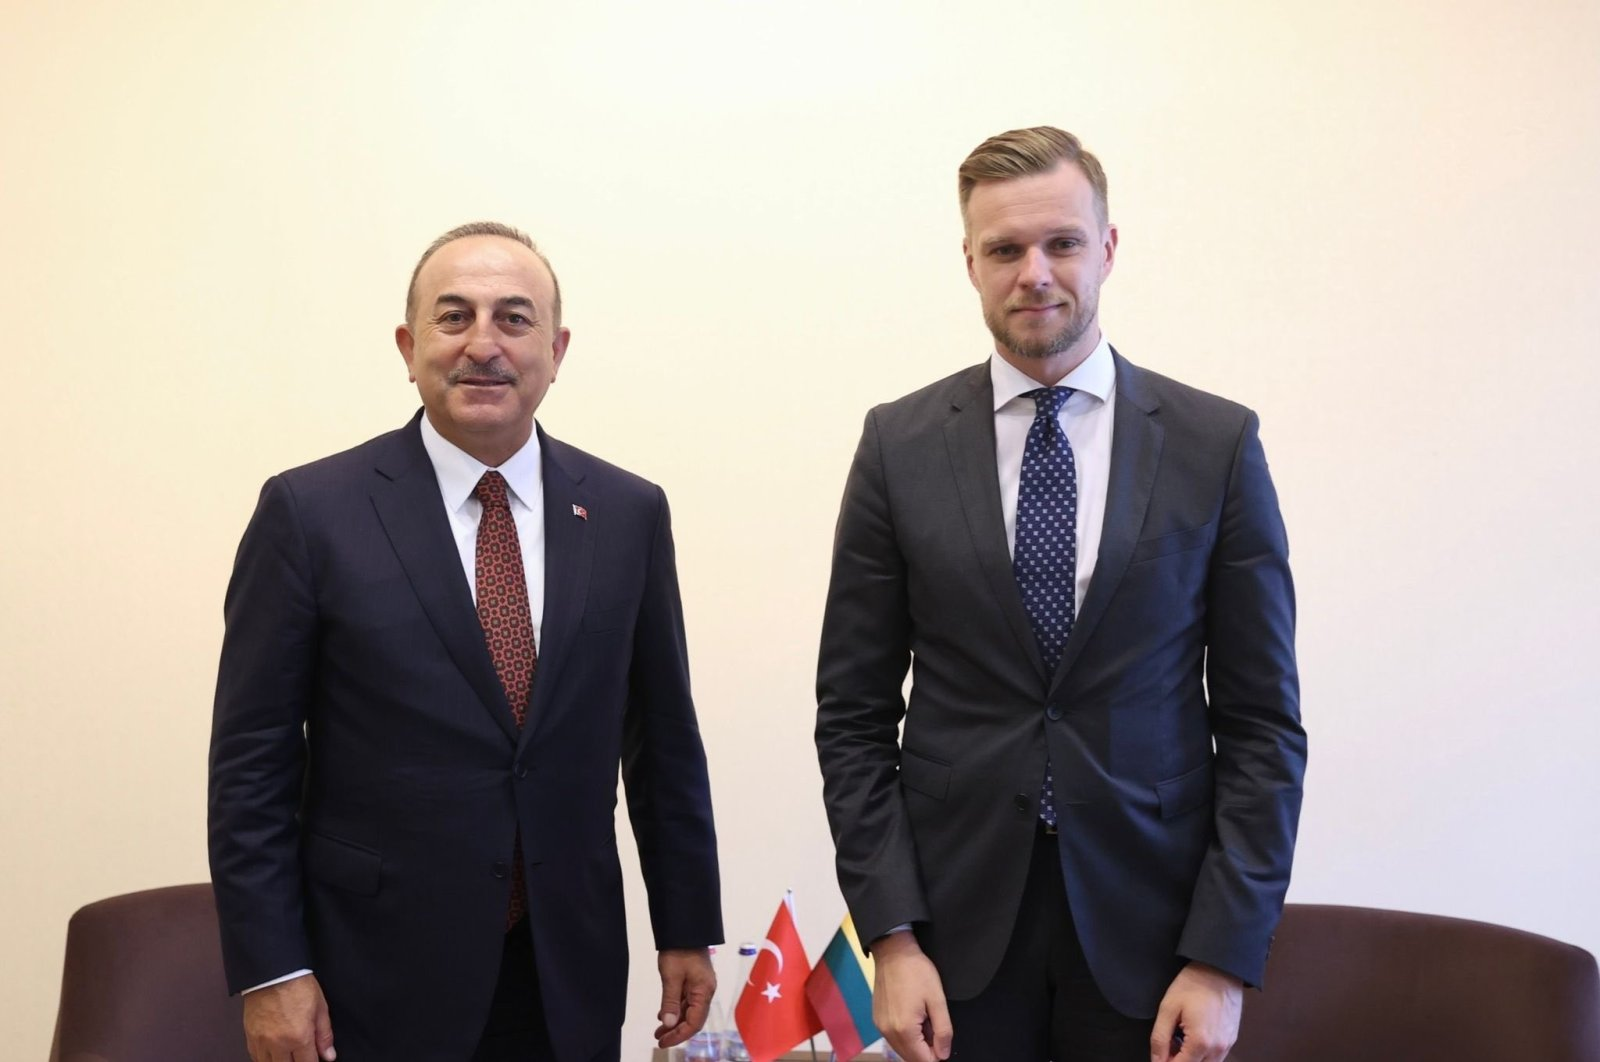 Turkey's Foreign Minister Mevlüt Çavuşoğlu (L) with Lithuanian Counterpart Gabrielius Landsbergis in Helsinki, Finland, July 8, 2021. (AA Photo)